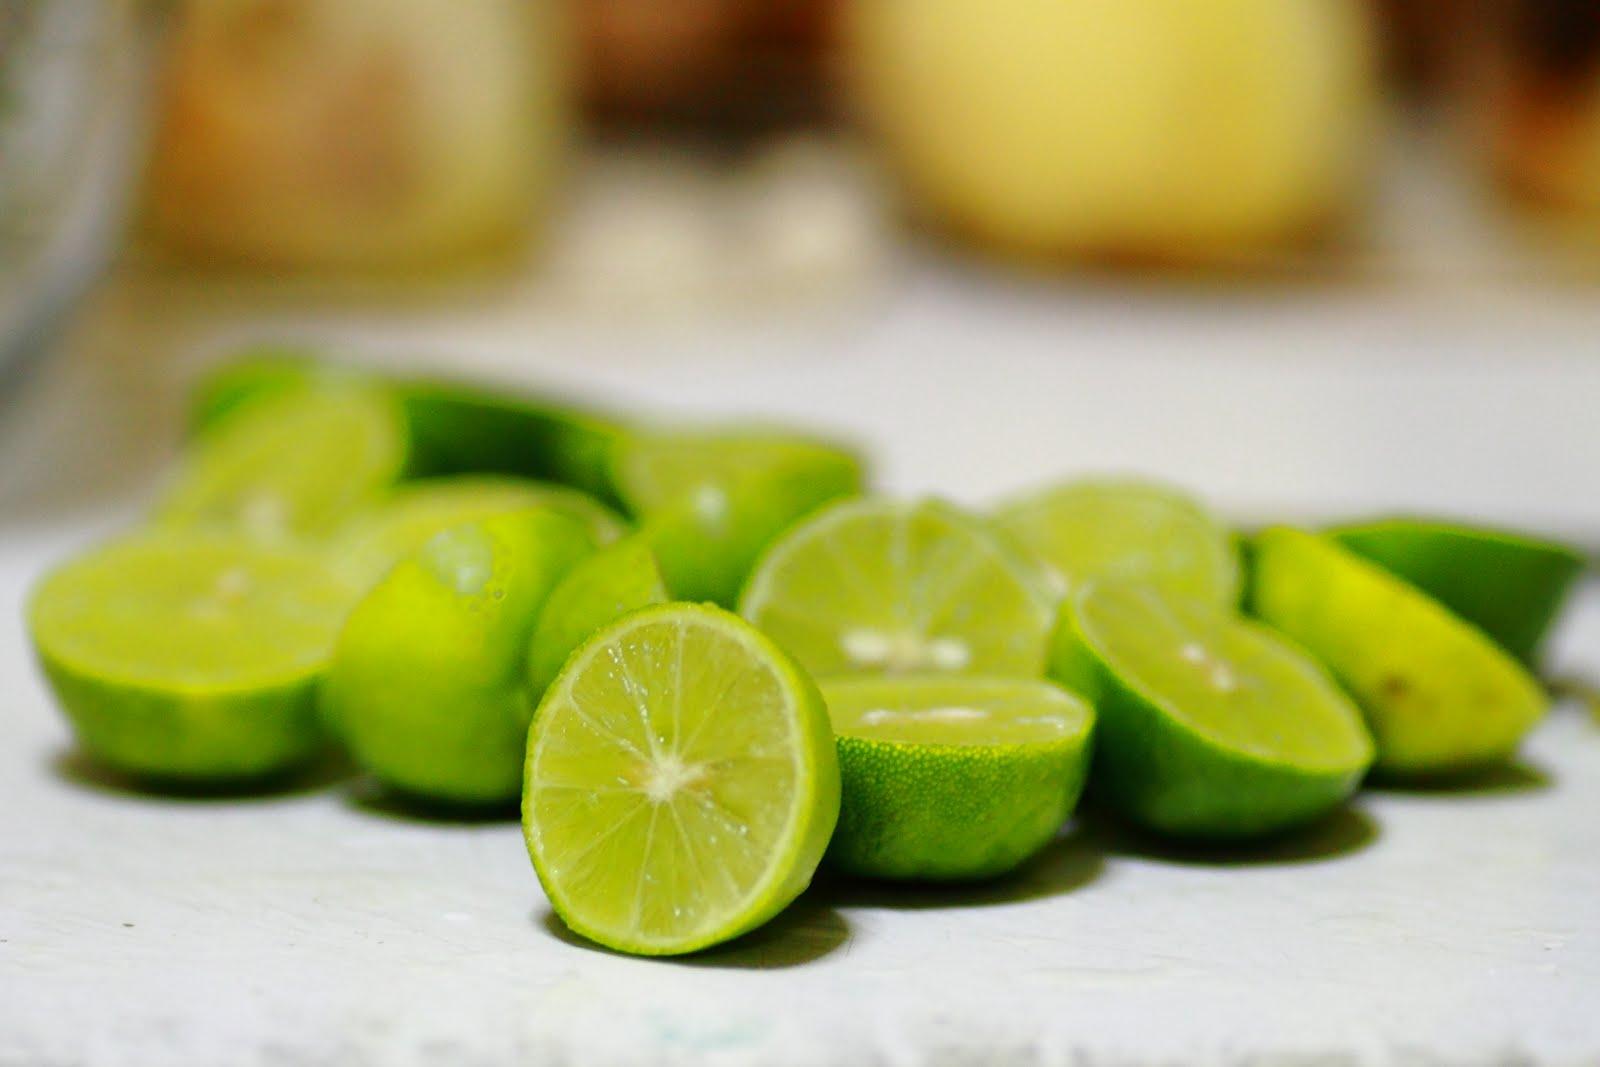 Sour Limes